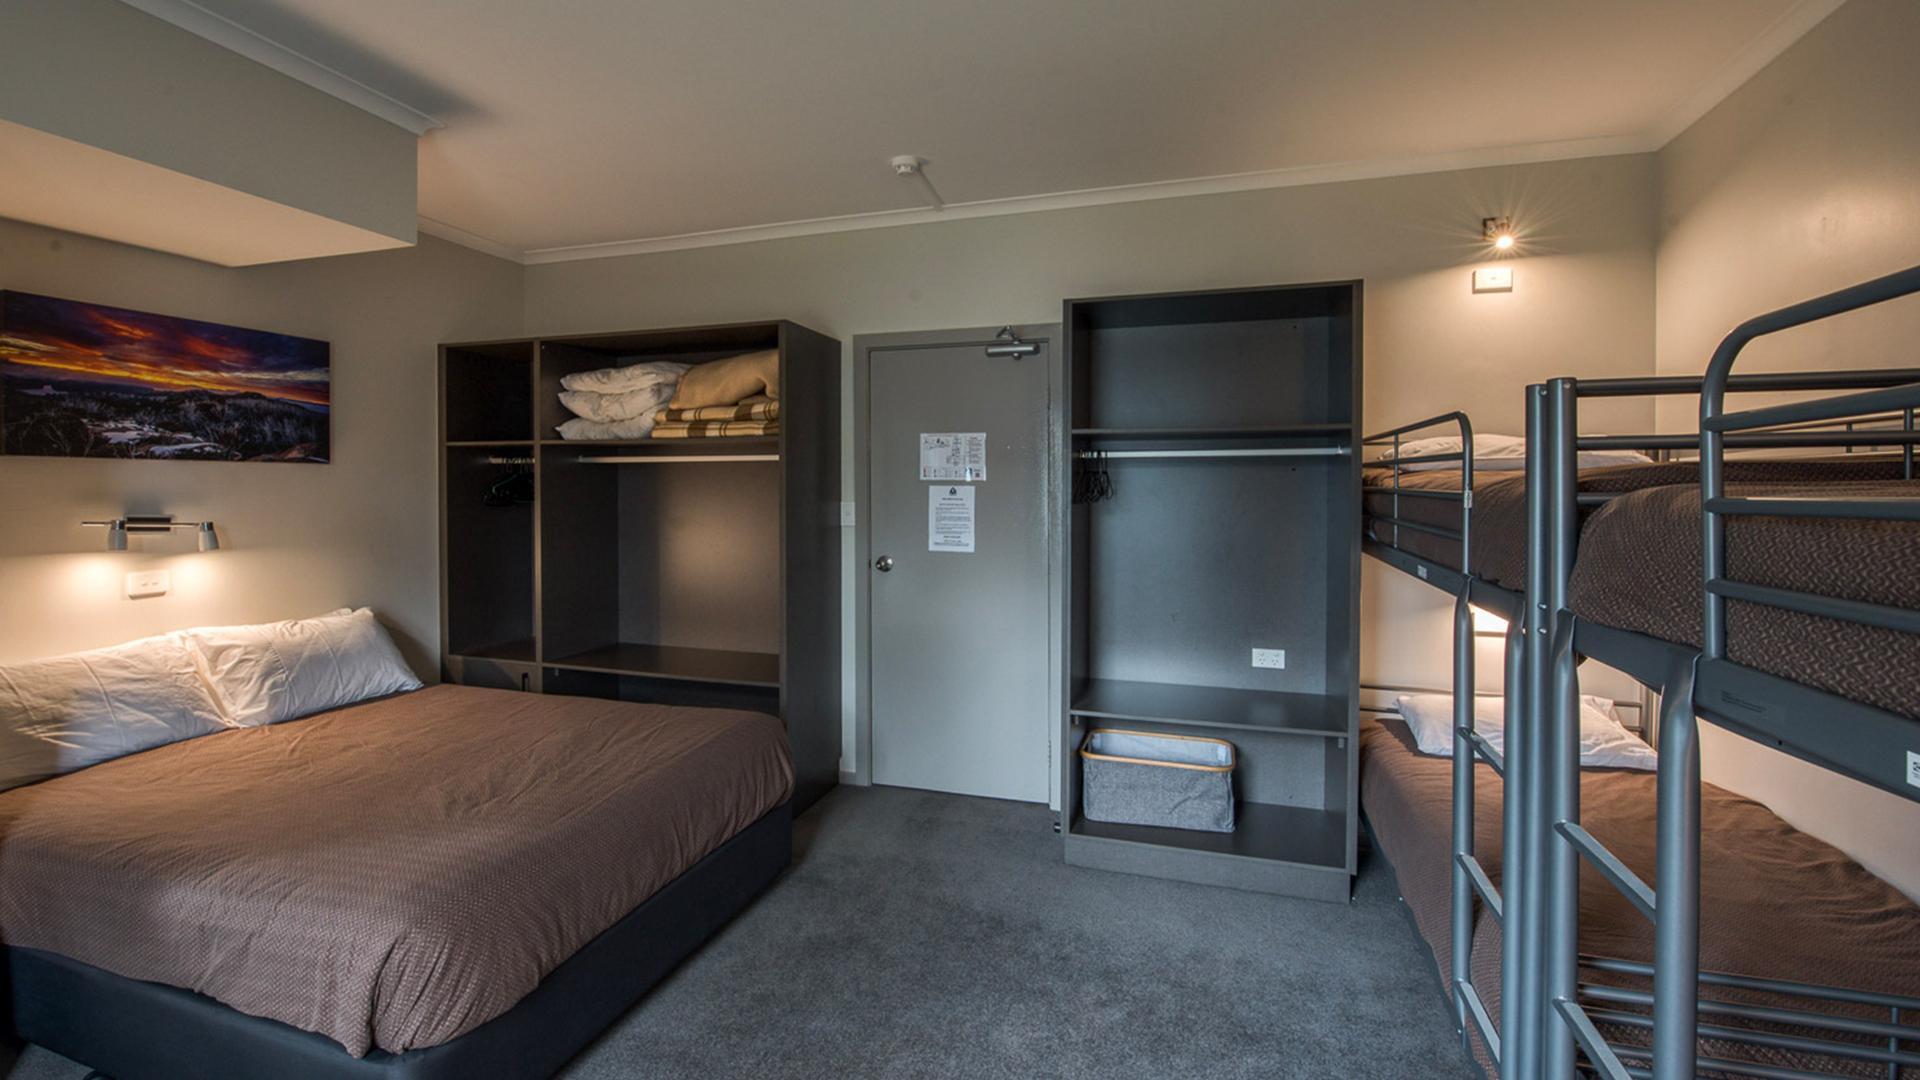 Kalyna Ski Club Room image 1 at Kalyna Ski Club by Mount Hotham Alpine Resort (Unincorporated), Victoria, Australia